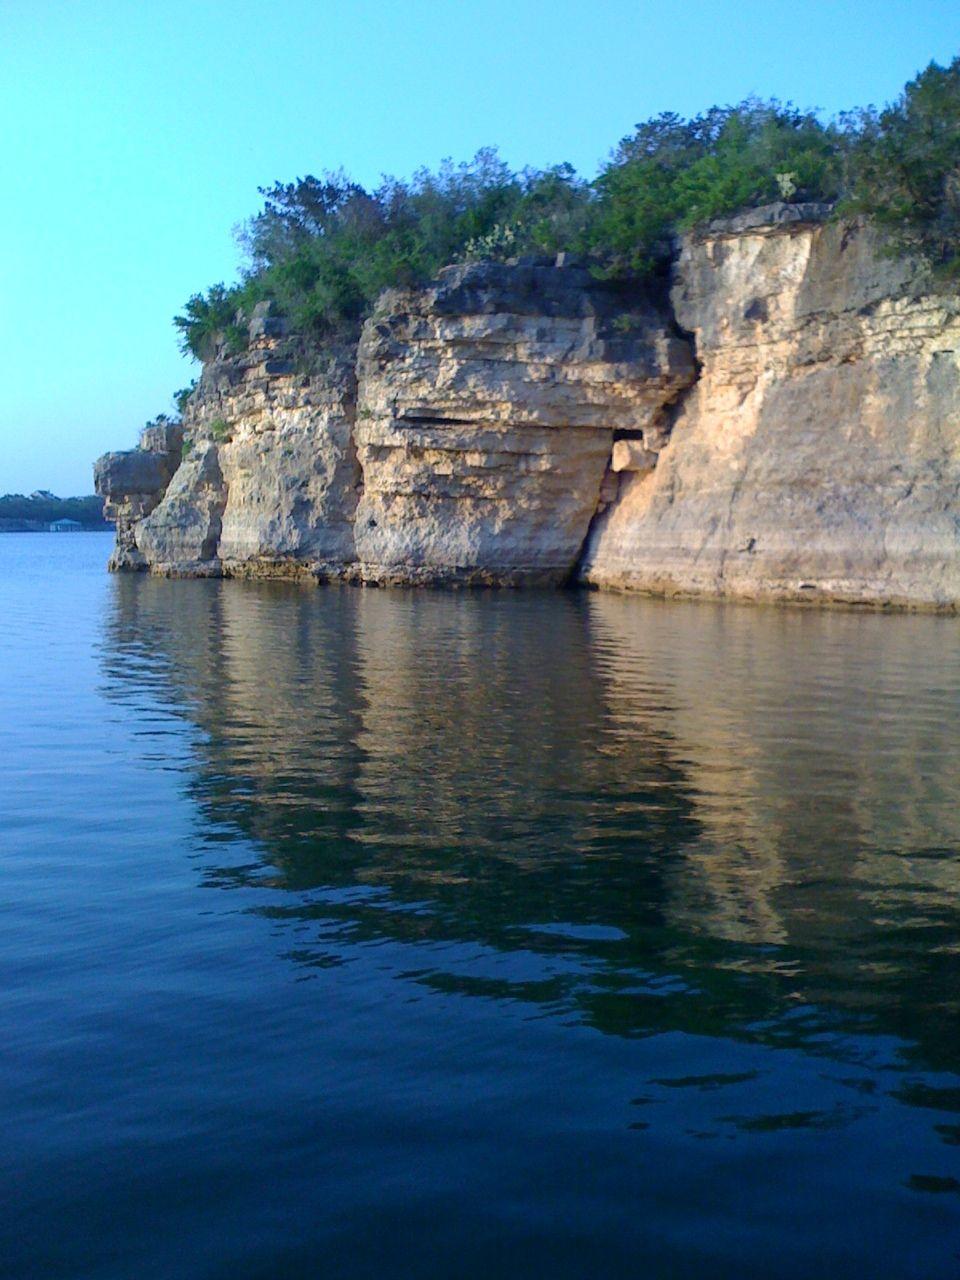 Lake travis texas pinterest for Fishing spots in austin